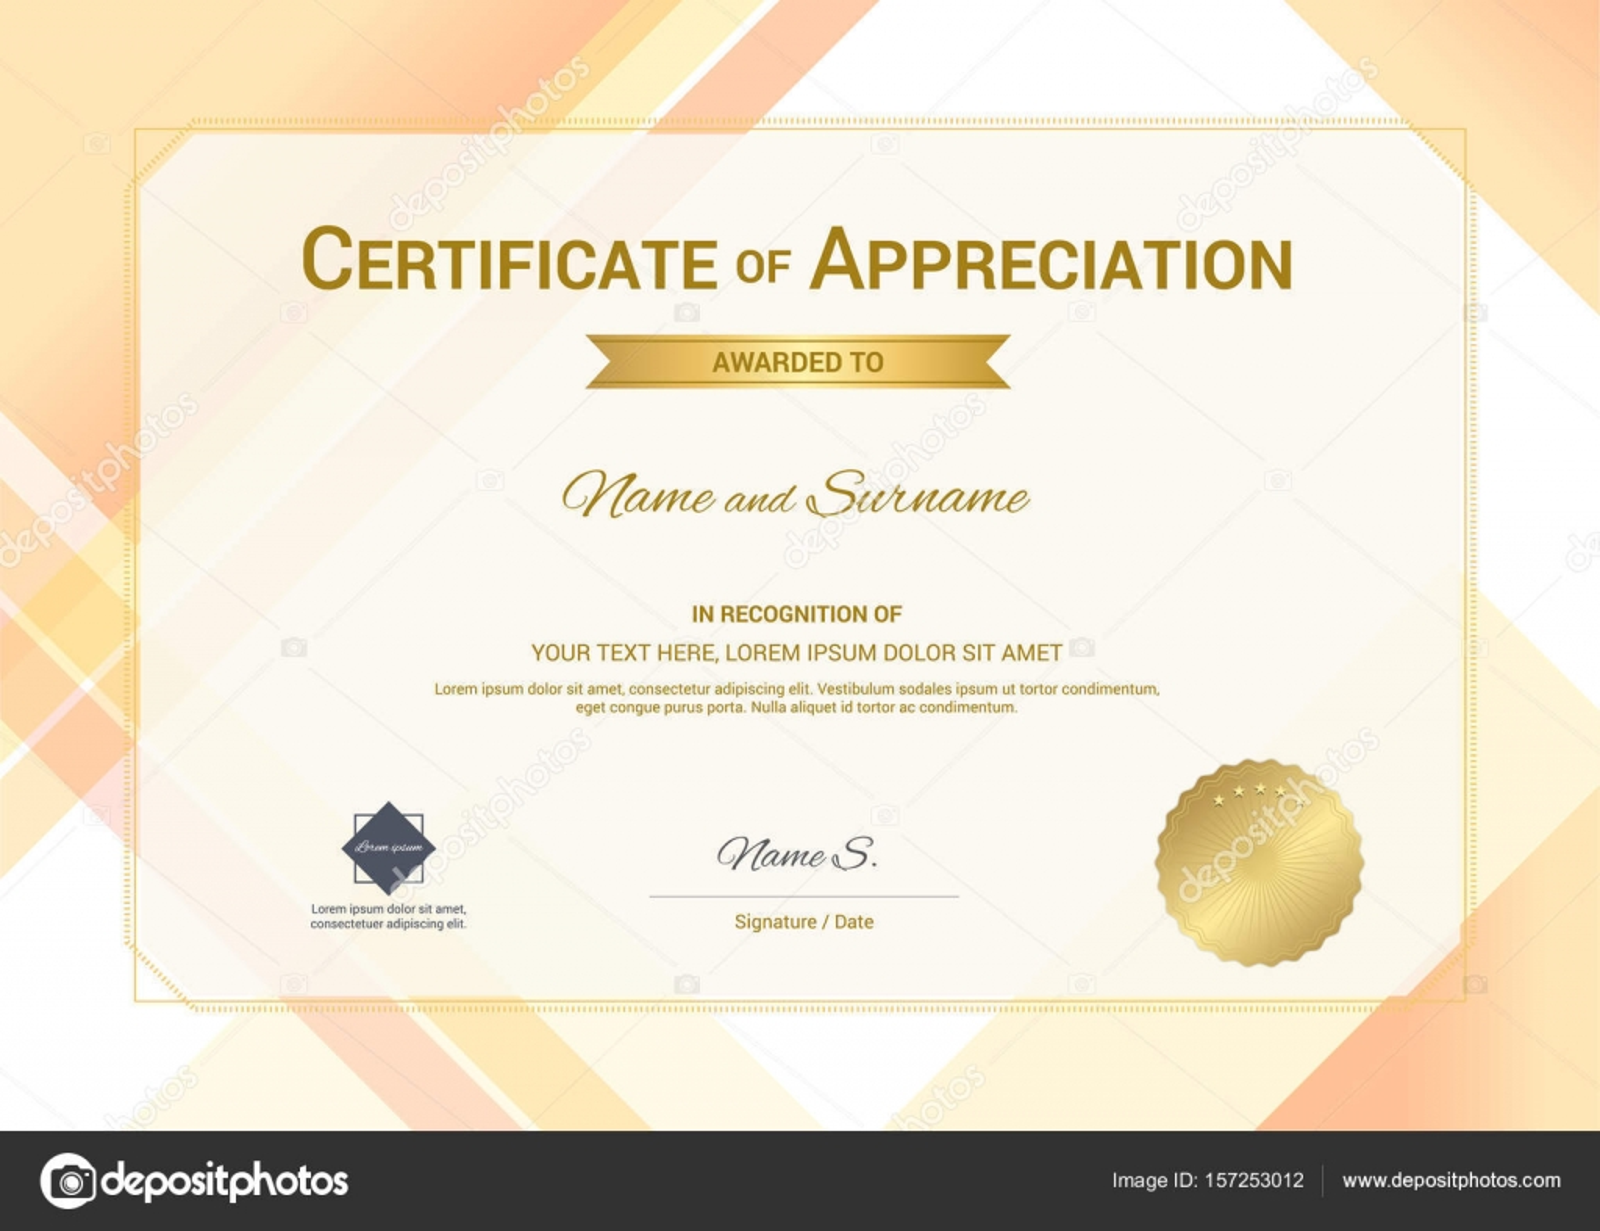 Moderne Zertifikat Wertschätzung Templates mit modernen bunten ...